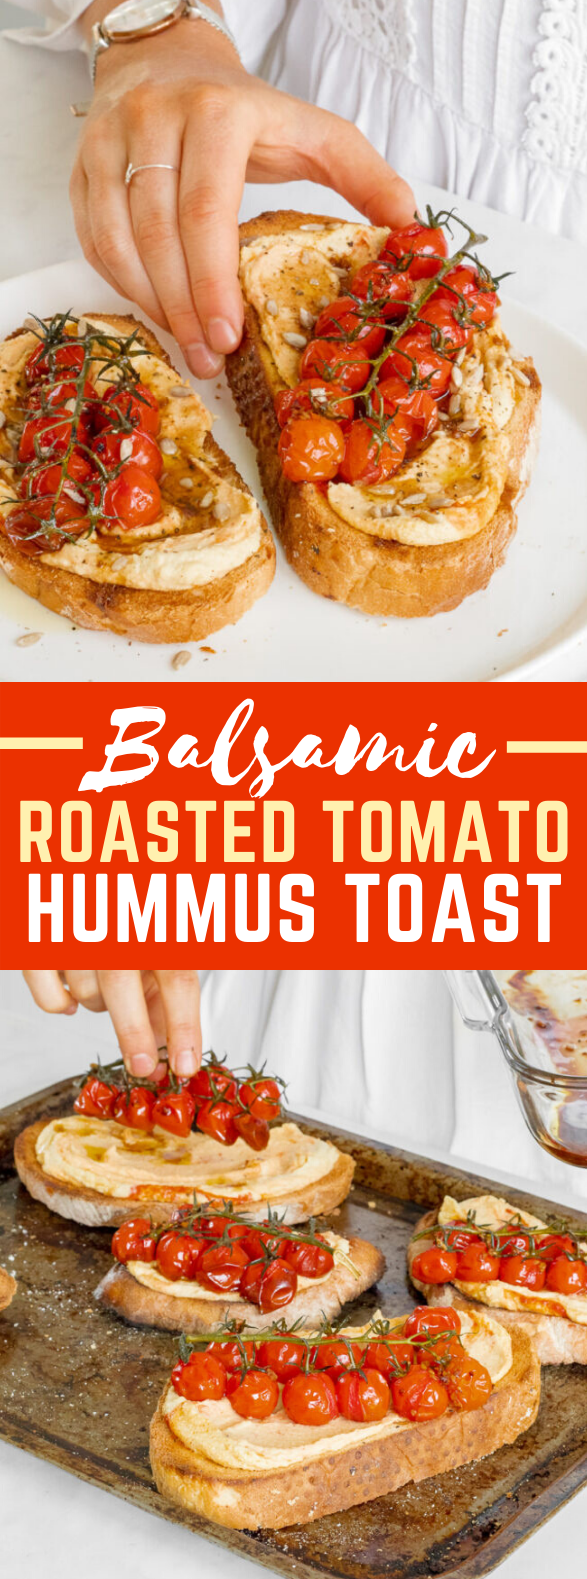 BALSAMIC ROASTED TOMATO & HUMMUS TOAST #vegan #lunch